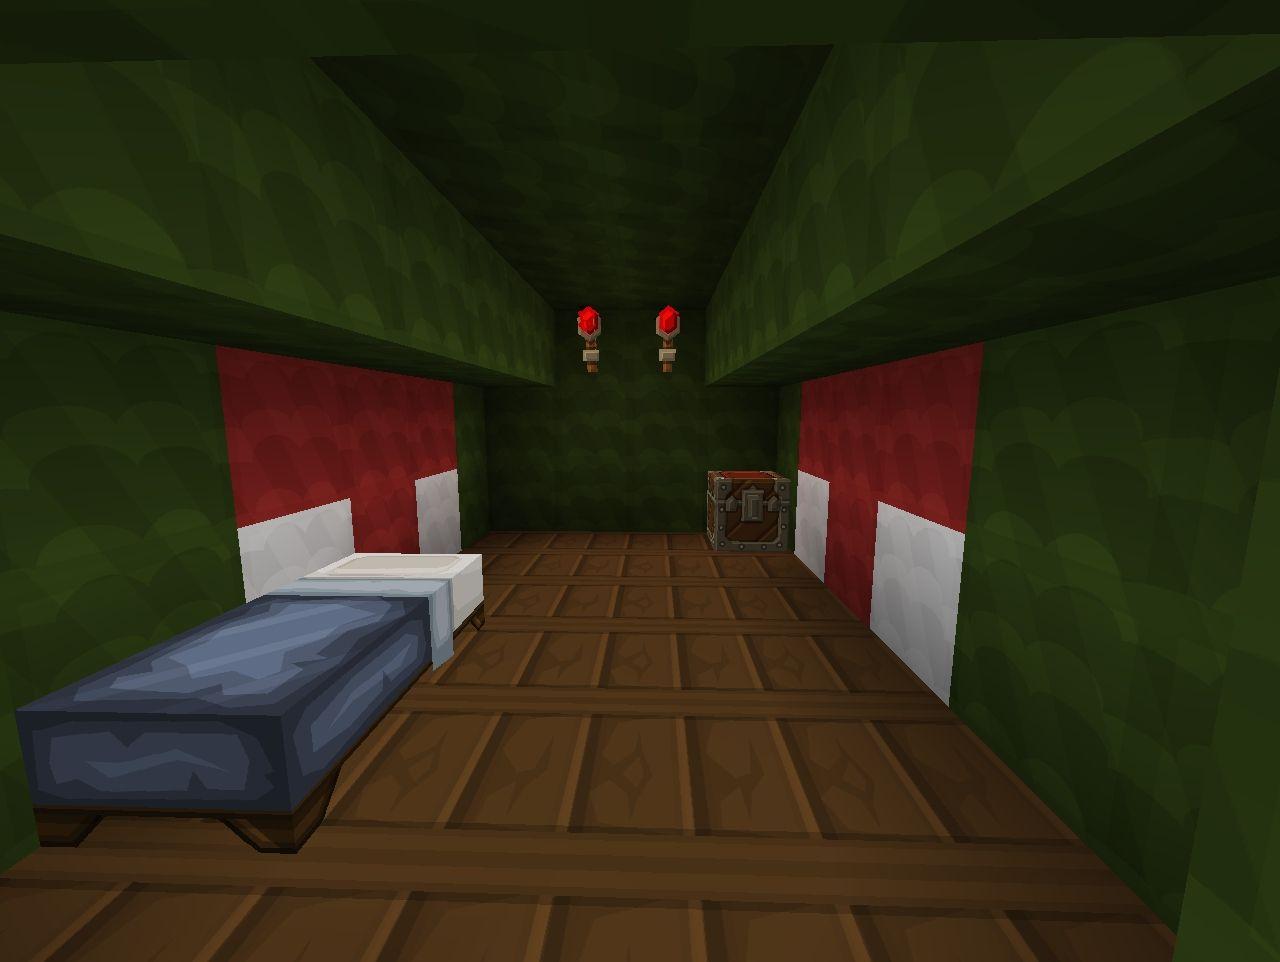 DayZ Mash Tent (2) & DayZ Mash Tent (2) Minecraft Project